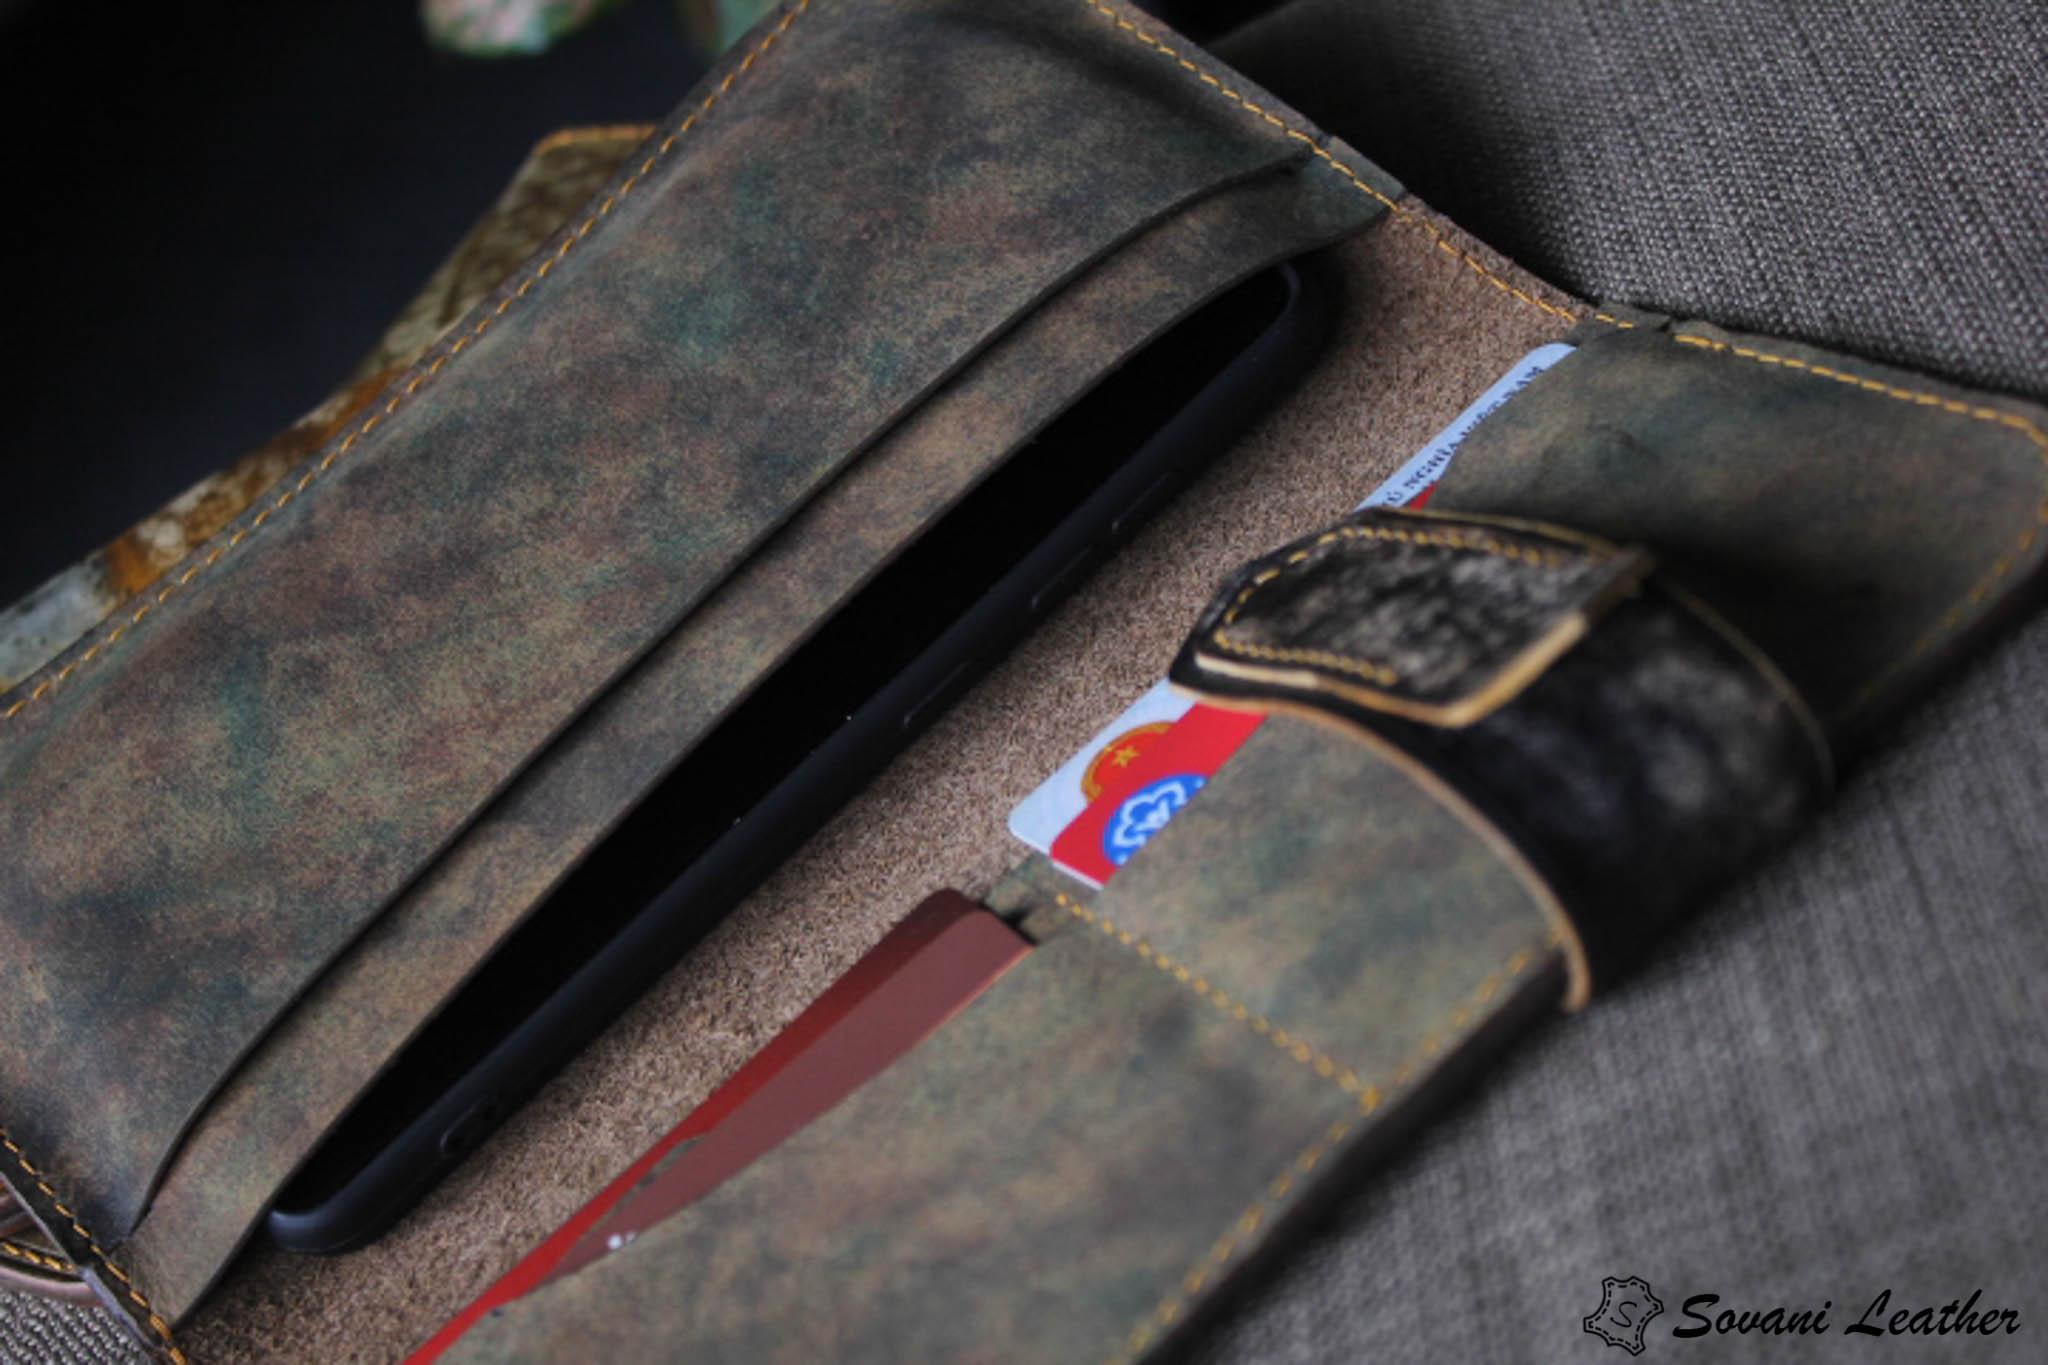 Ví cầm tay handmade cao cấp – Vegetable tan patina 18